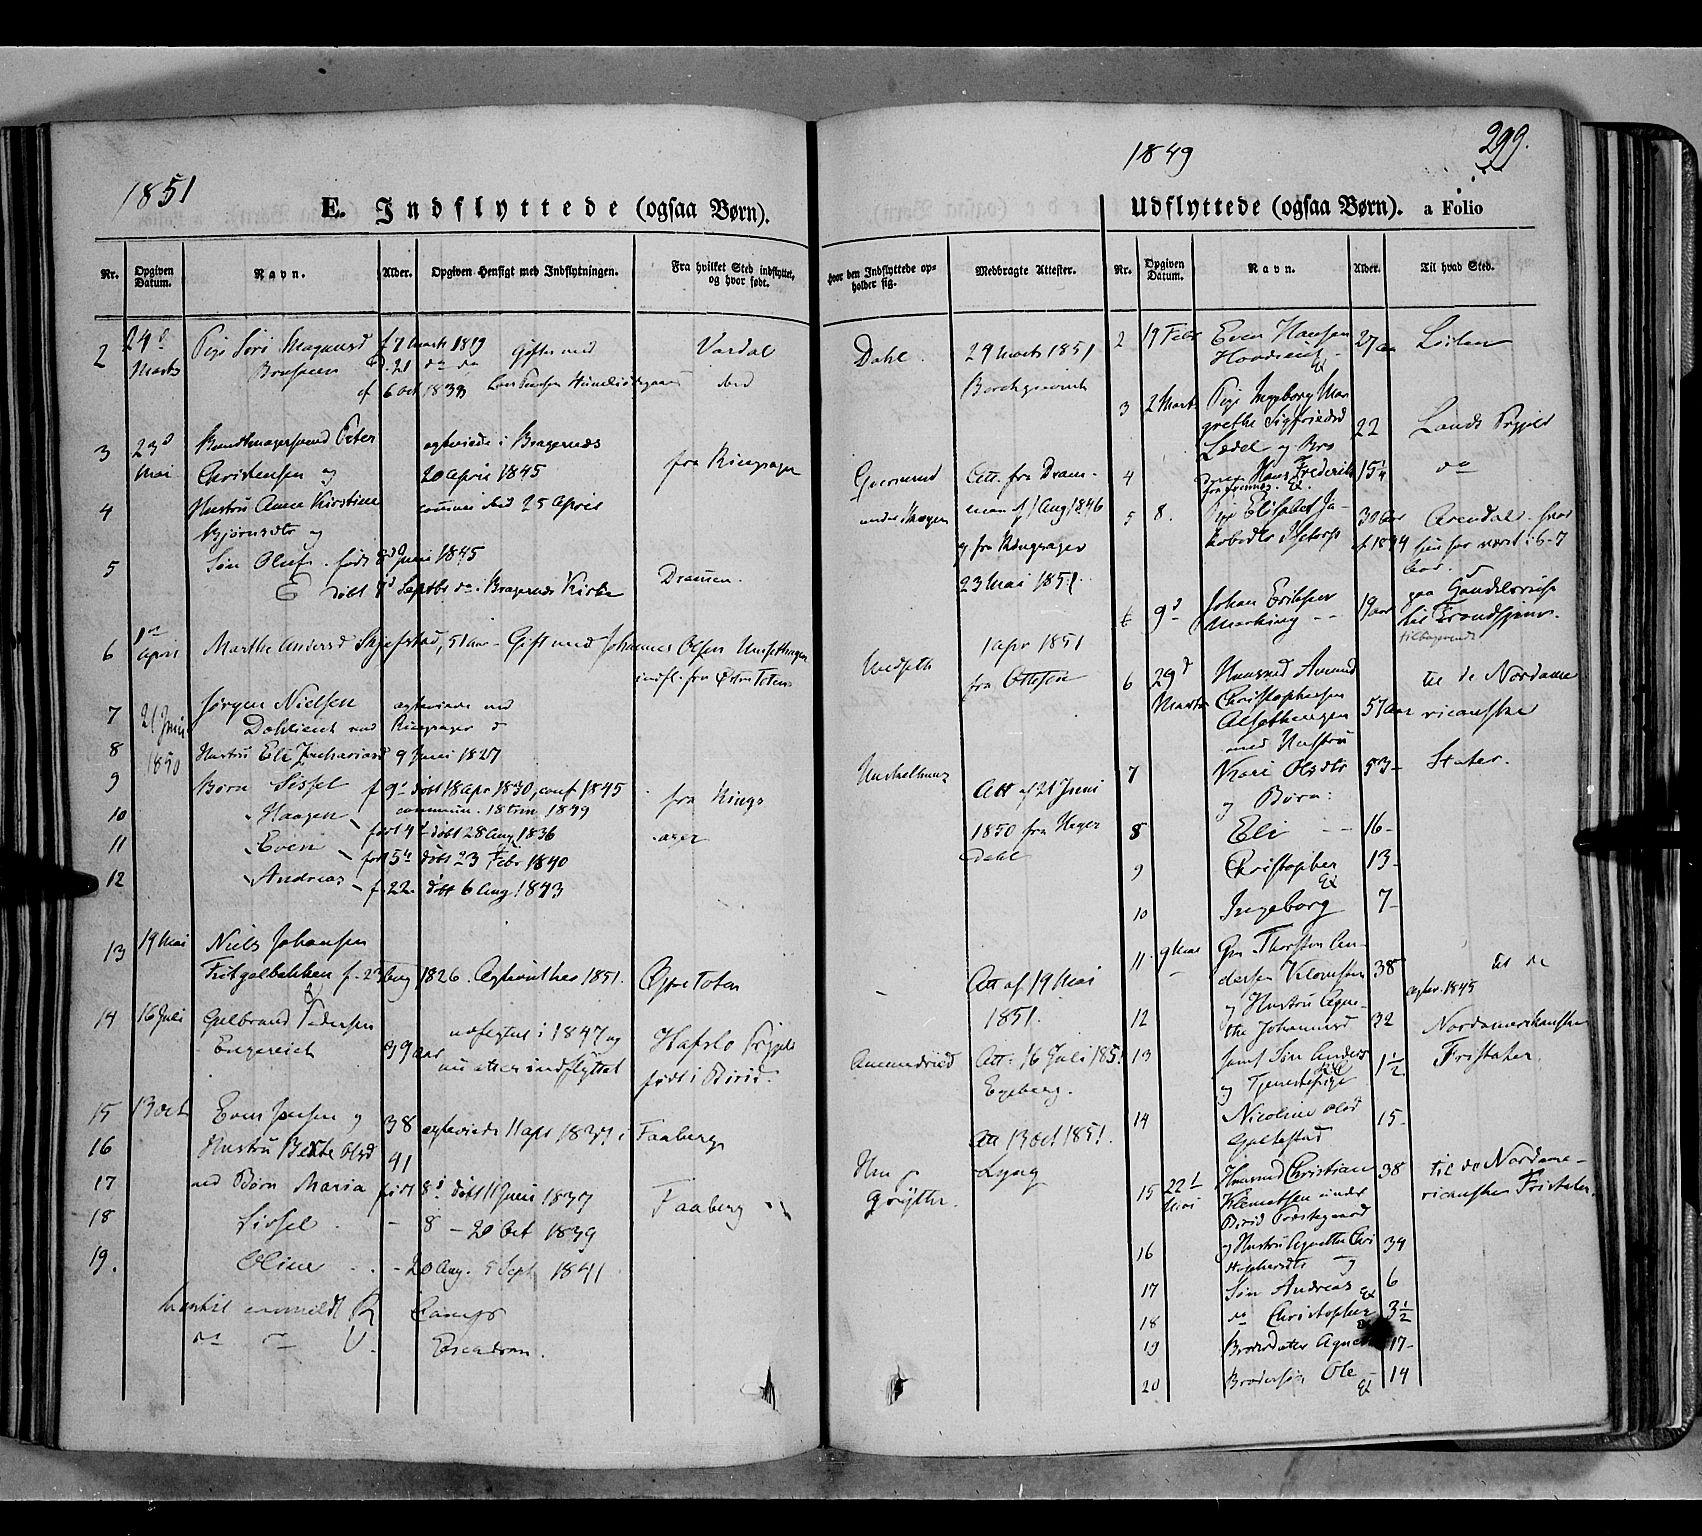 SAH, Biri prestekontor, Ministerialbok nr. 5, 1843-1854, s. 299